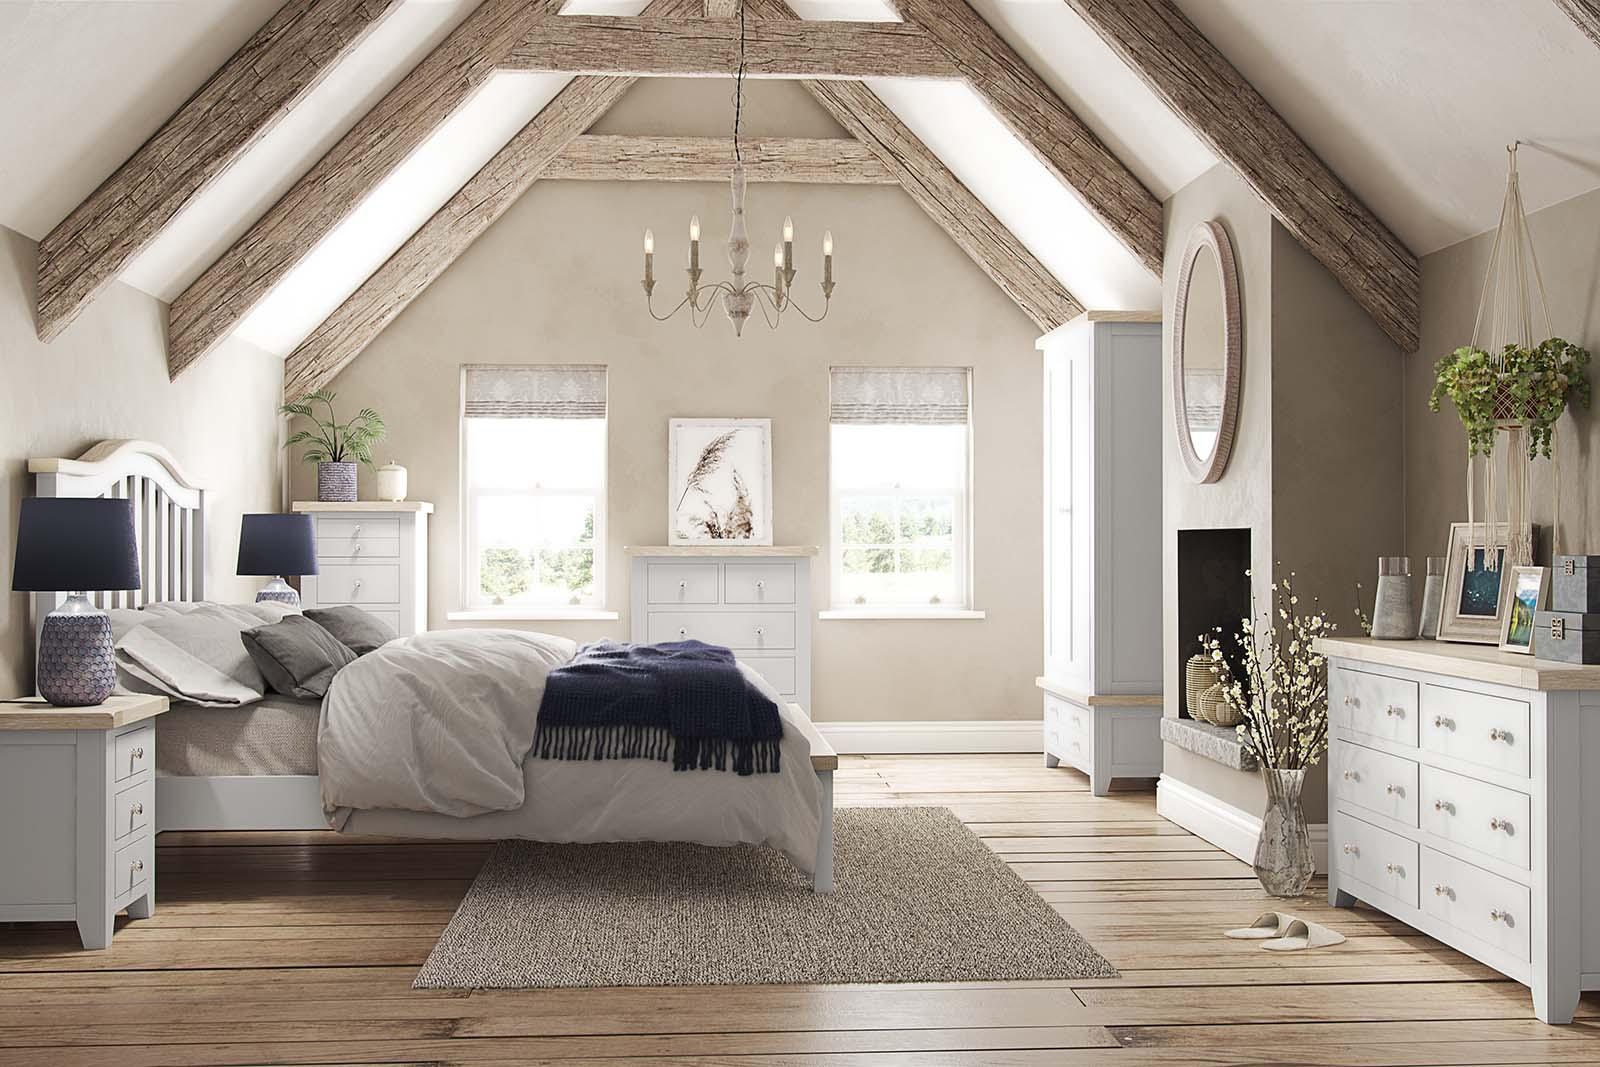 Portfolio_Interior_Product_BS_Painted_Bedroom_Final_Work_05_1600